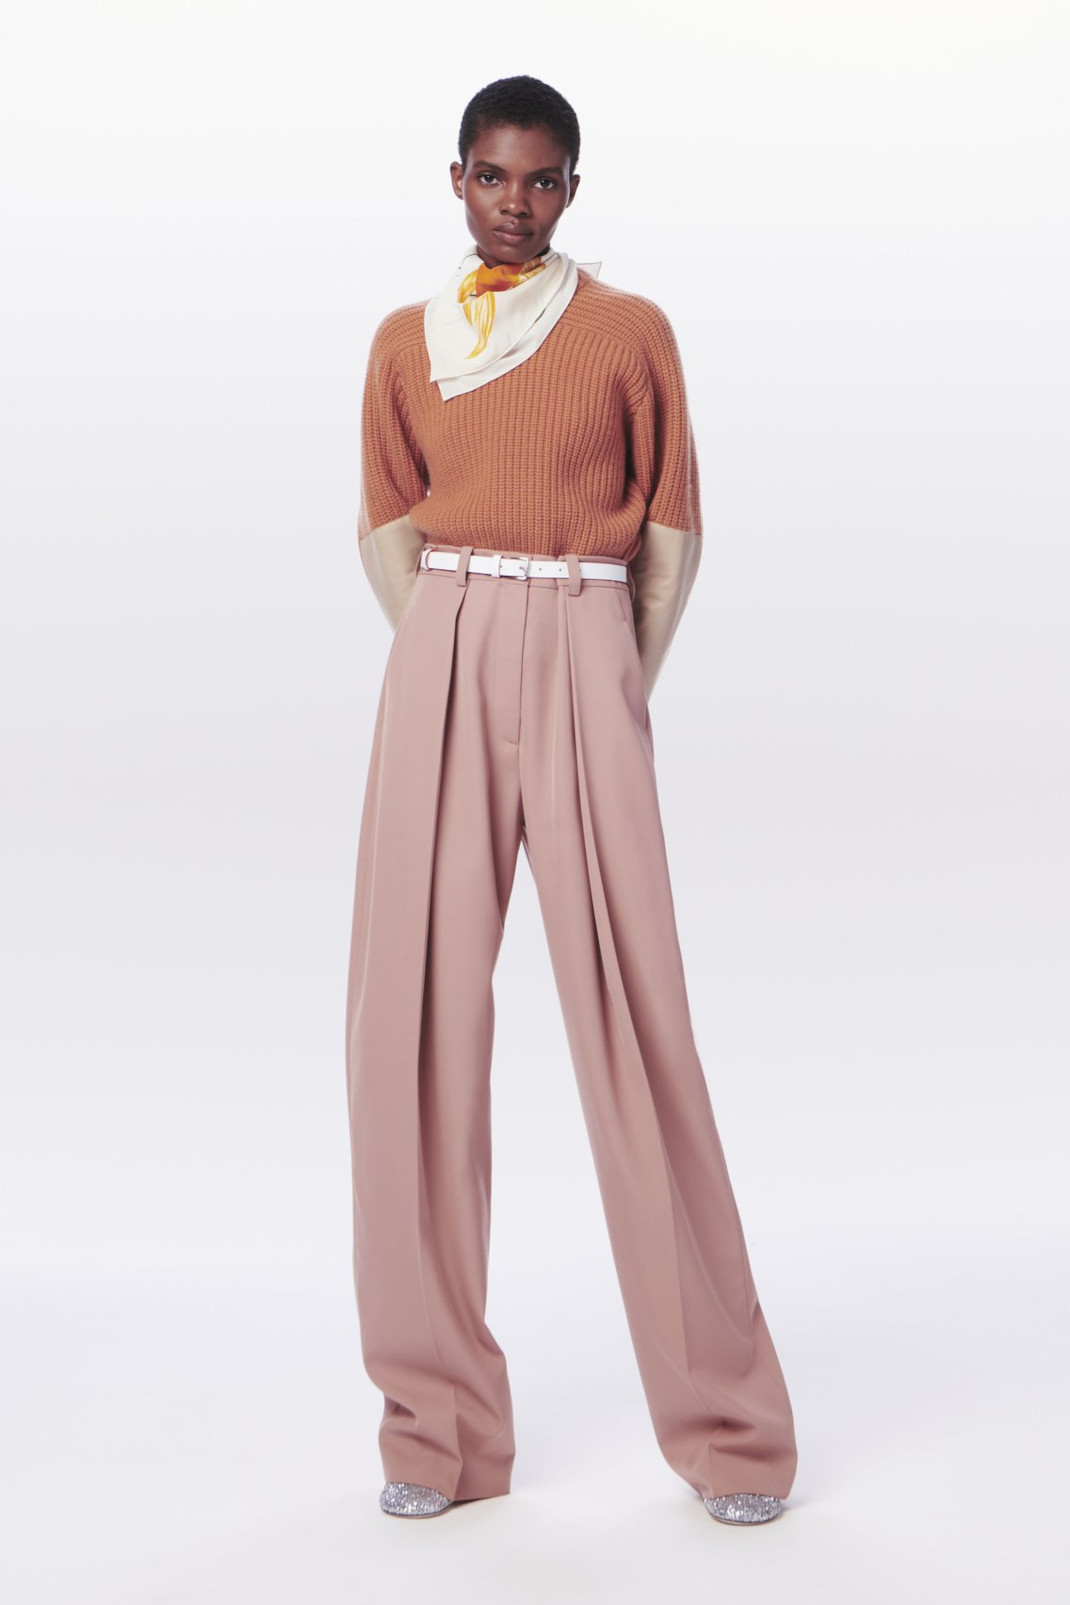 To χρώμα στα παντελόνια που αγαπάει η Βικτόρια Μπέκαμ για το φθινόπωρο